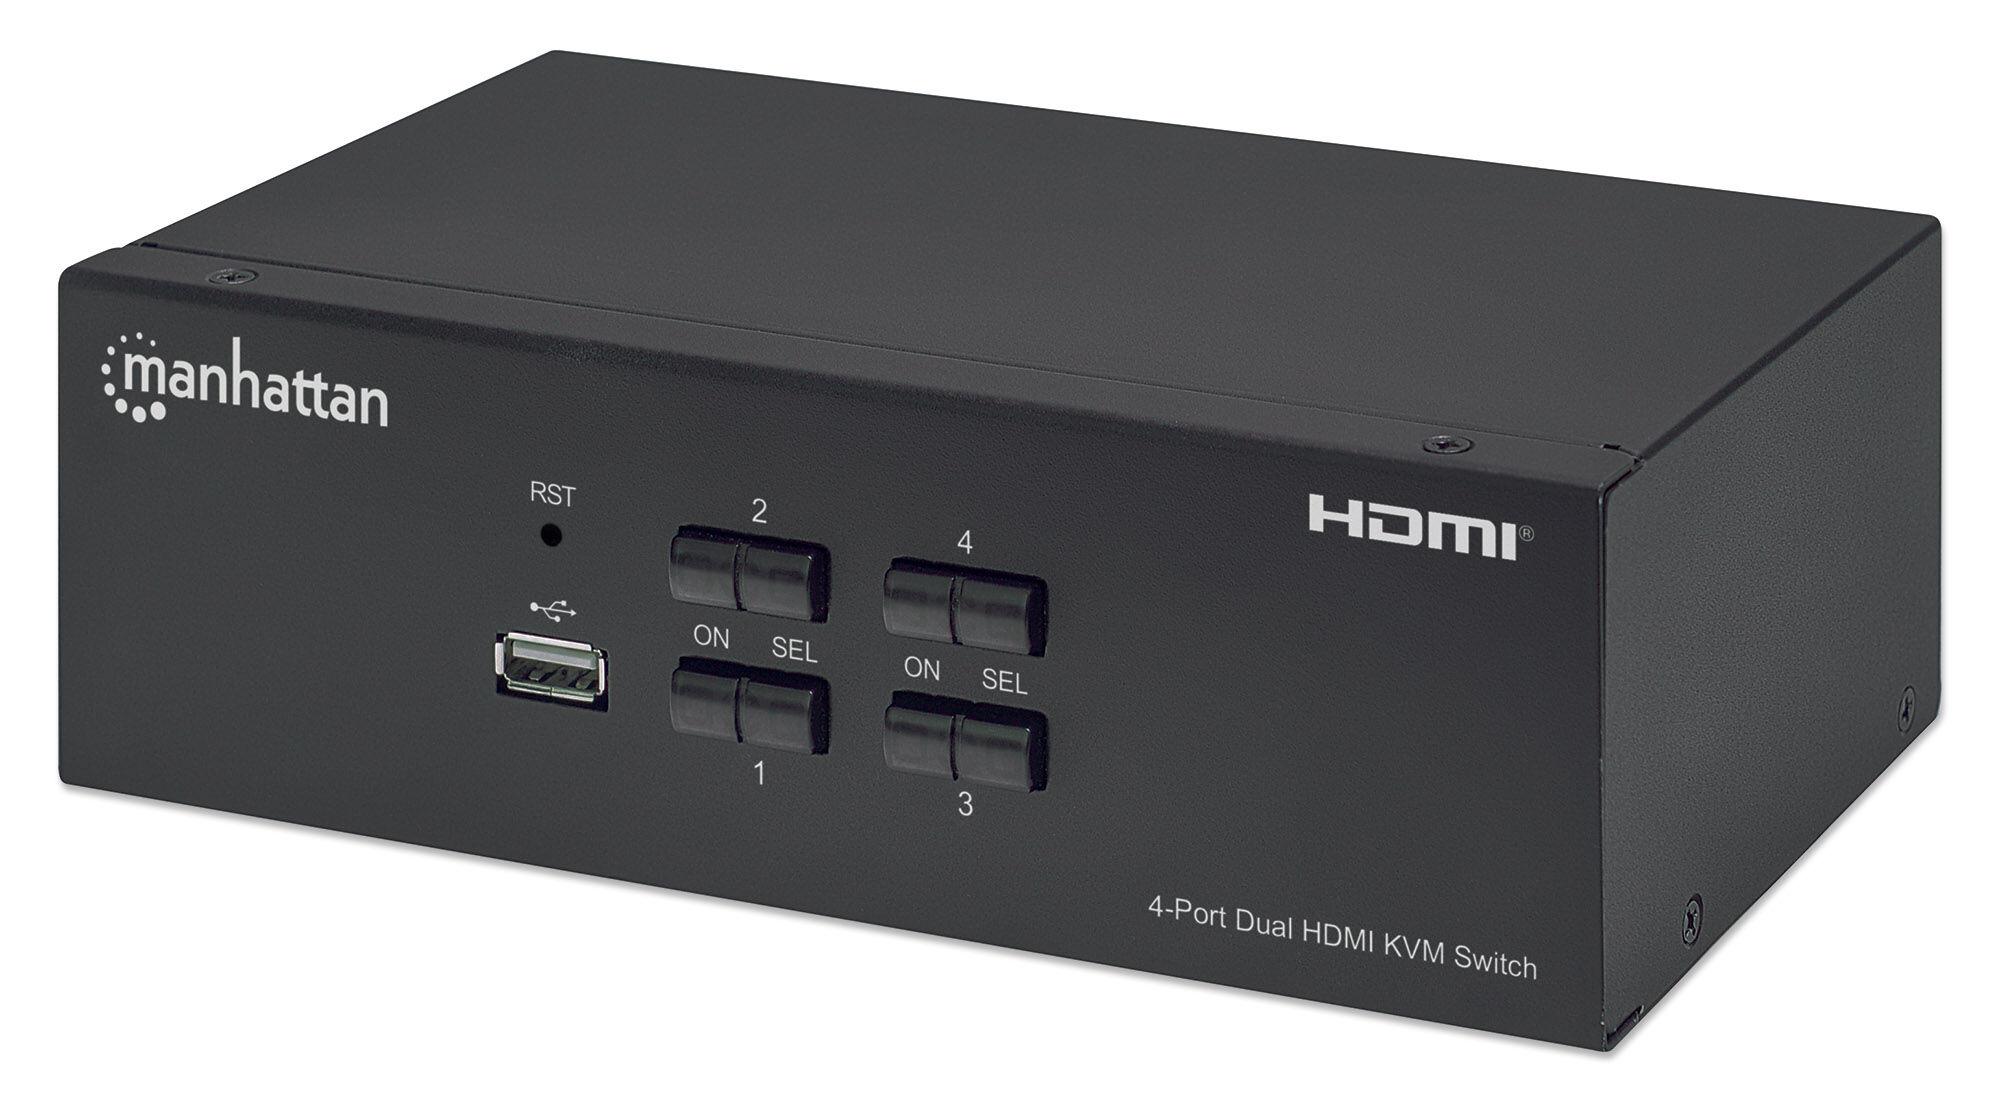 manhattan switch kvm hdmi 4 porte doppio monitor